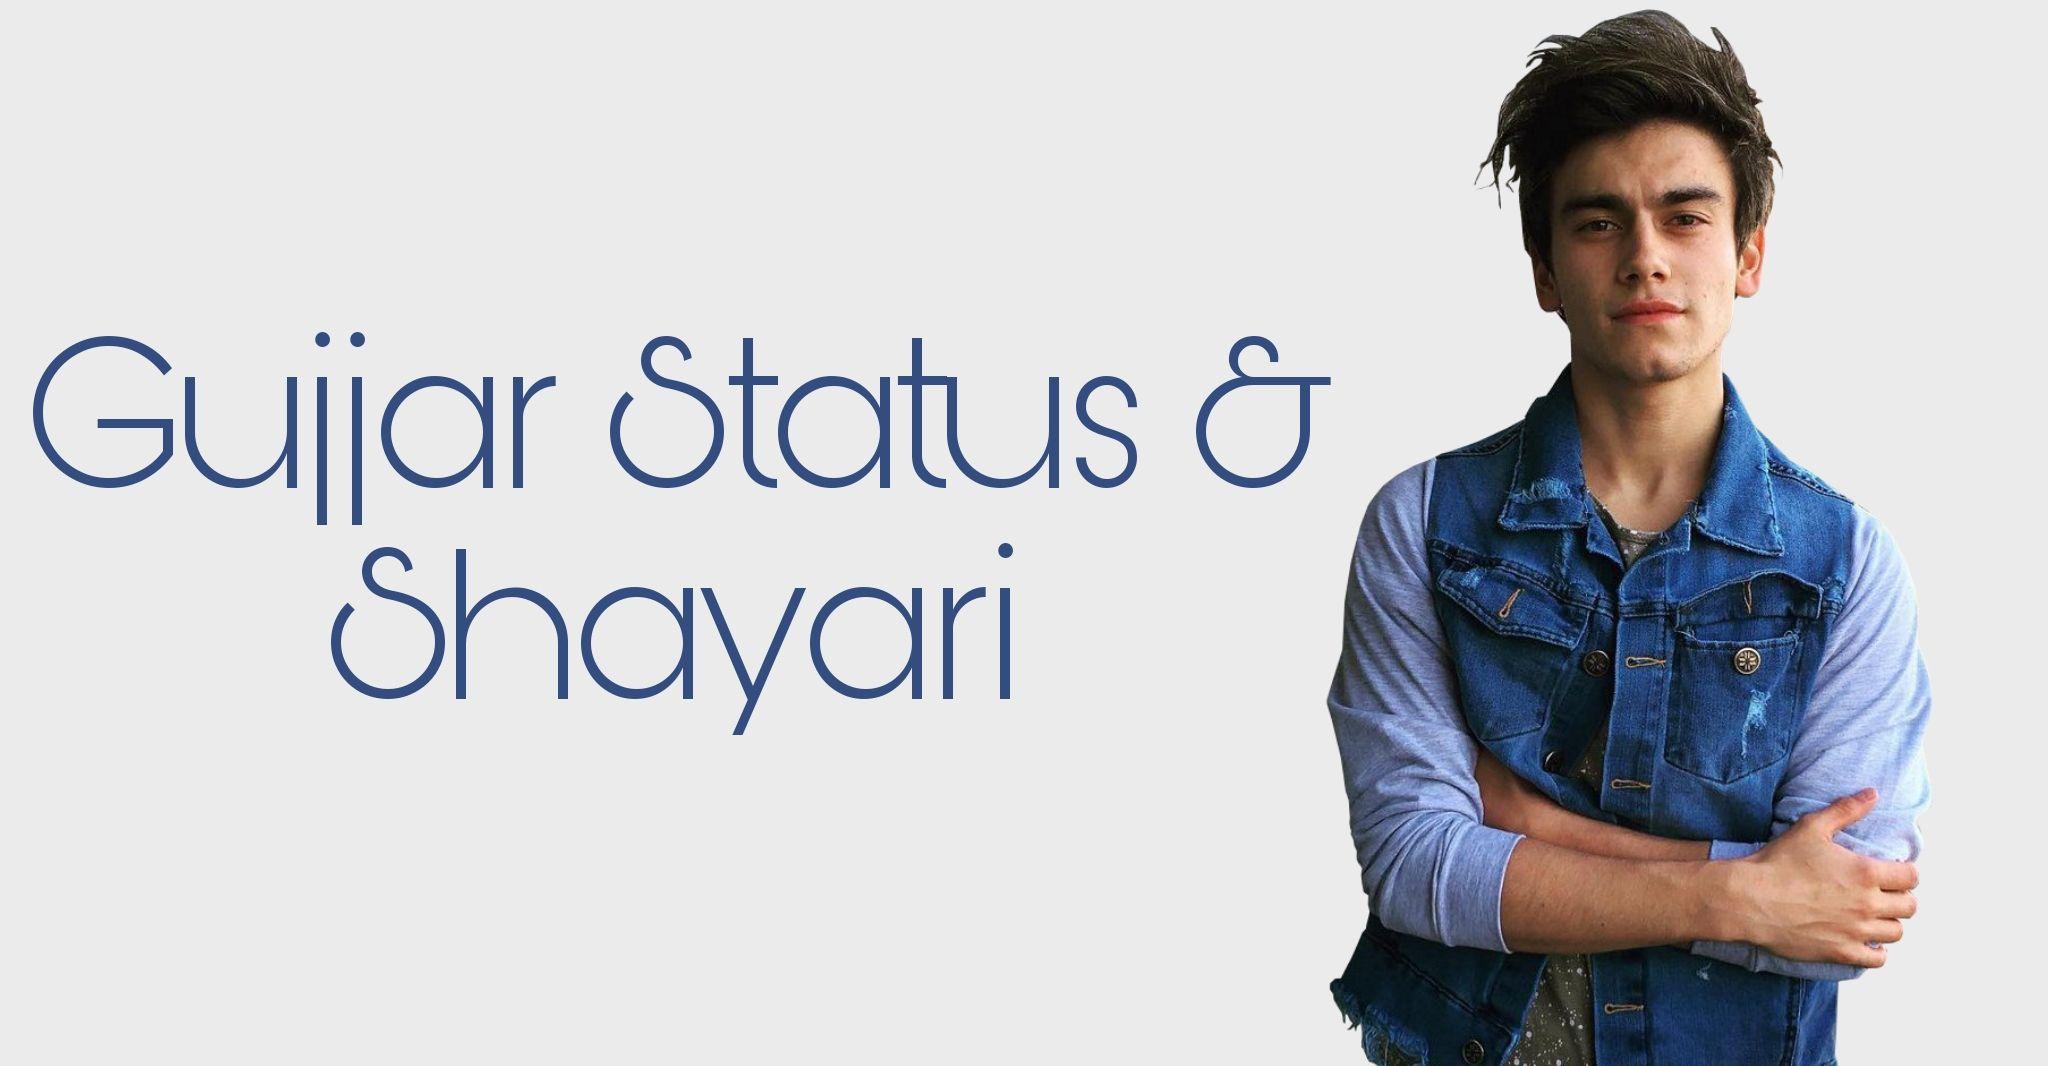 Gujjar Status, Gujjar Status in Hindi, Gujjar Status Hindi, Gujjar Status in English, Gujjar Status 2021